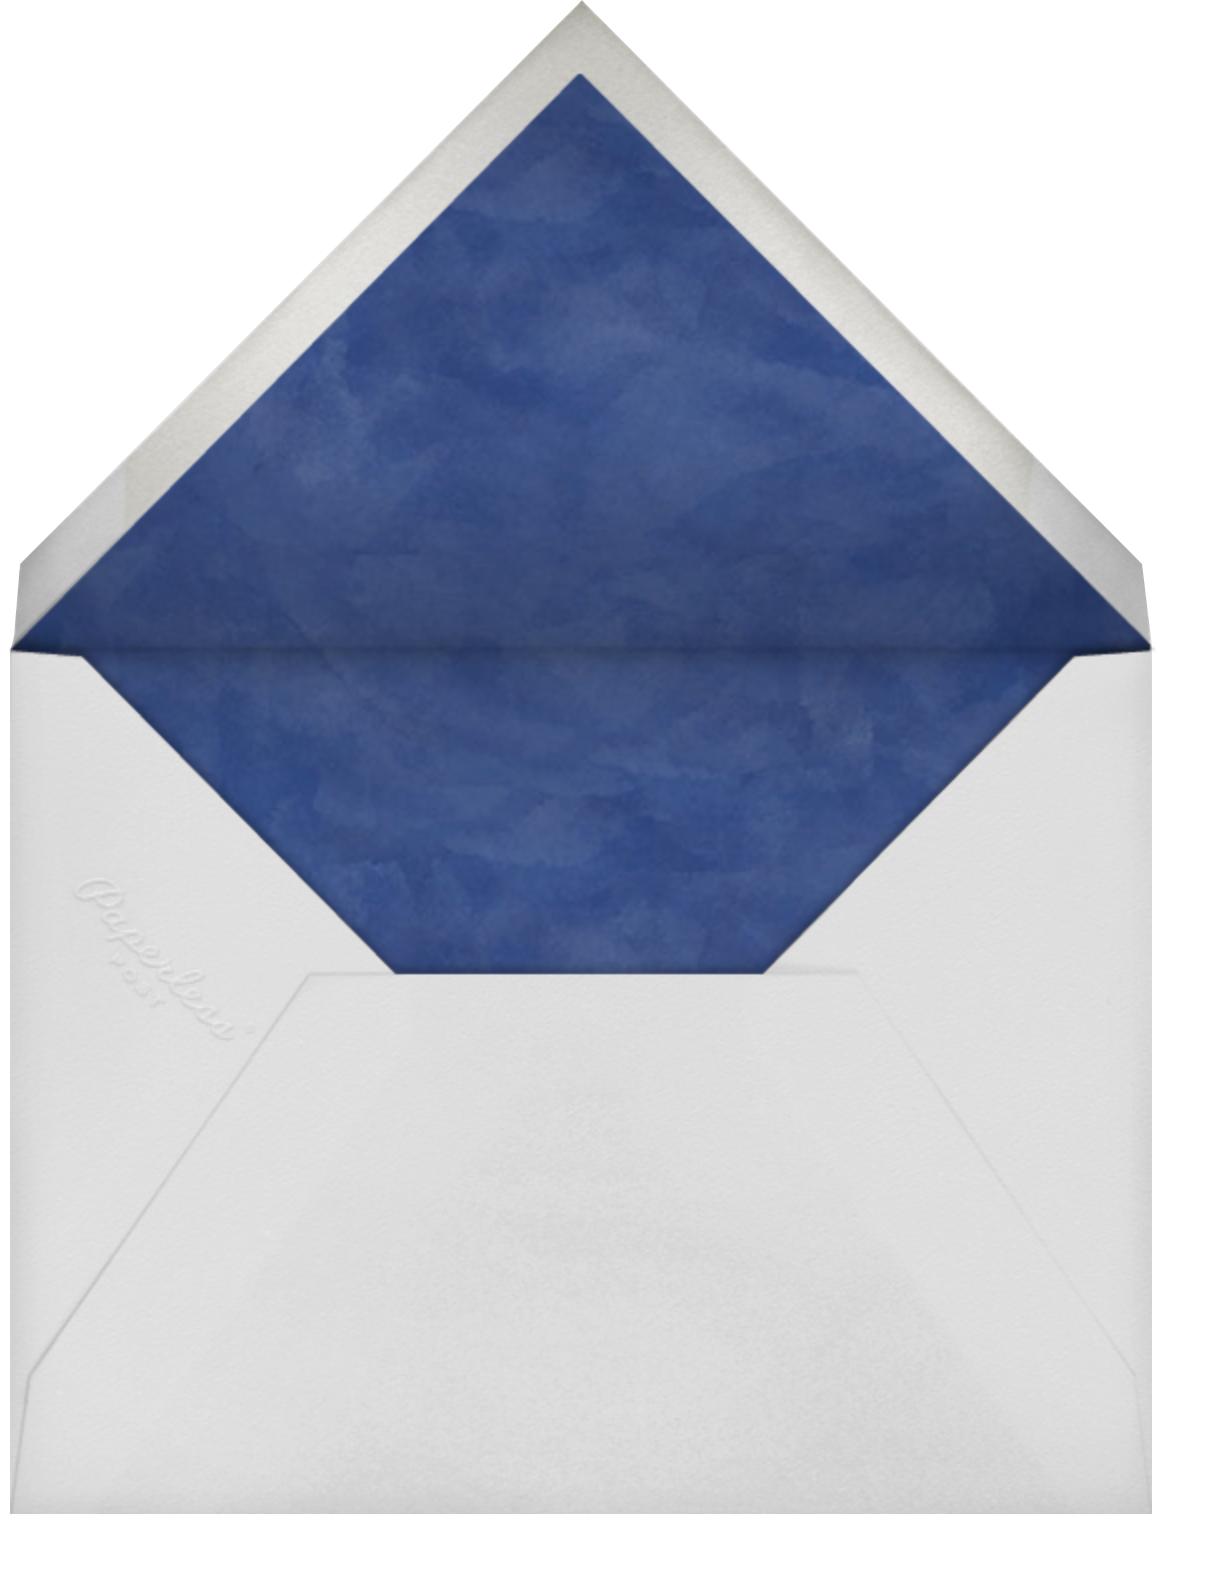 Floral Trellis II - Blue/Silver - Oscar de la Renta - All - envelope back